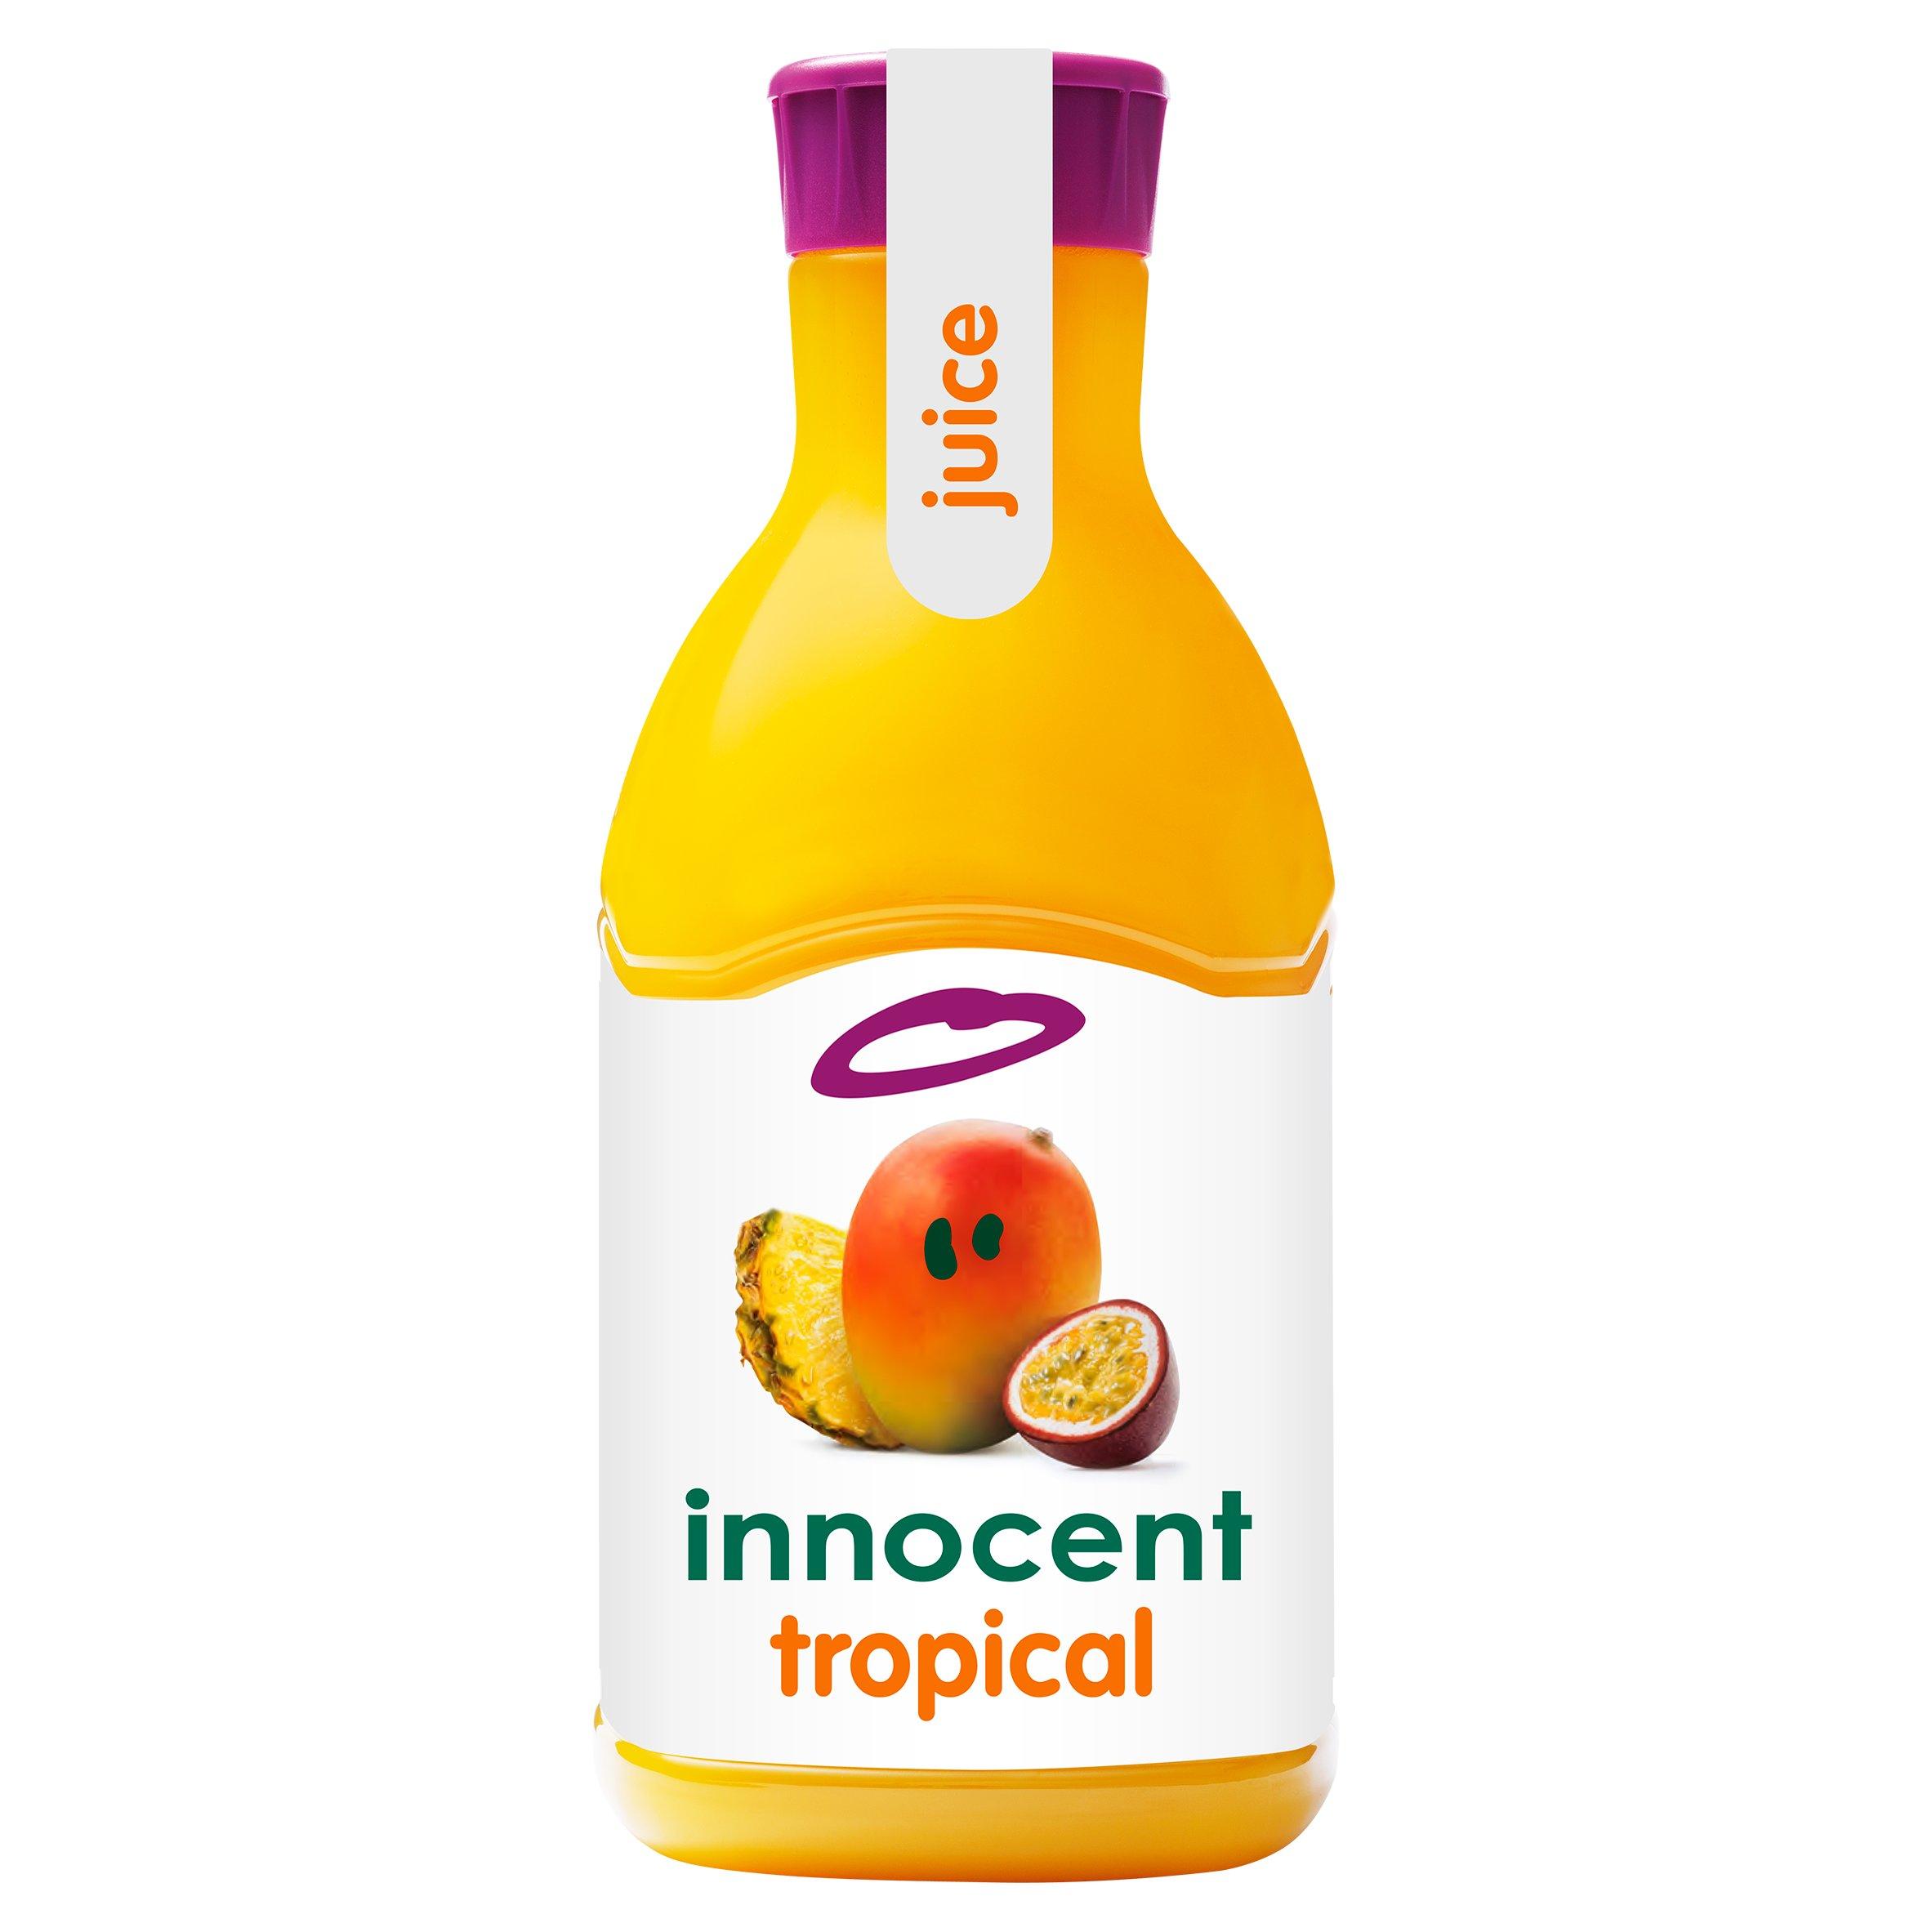 Innocent Tropical Juice 1.35 Litres